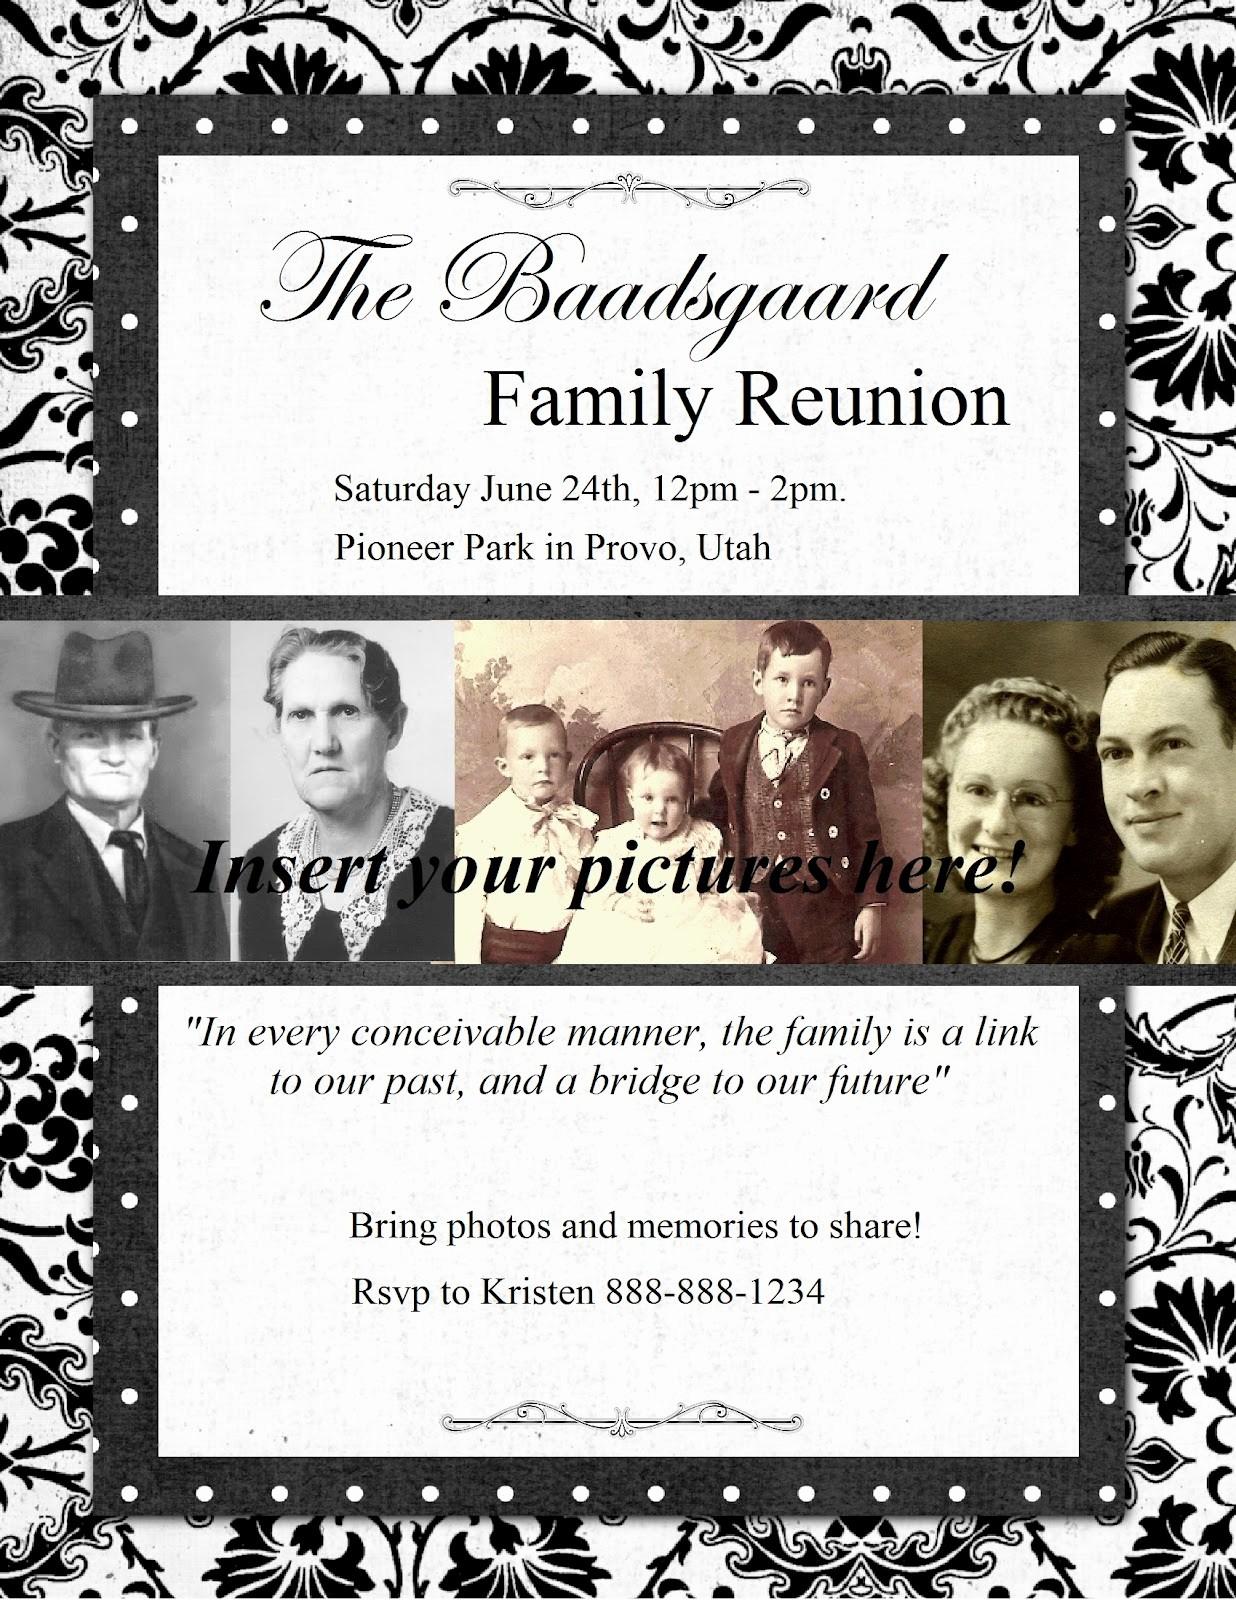 Free Family Reunion Flyers Templates Luxury Heritage Collector Storybook Family Reunion Flyers